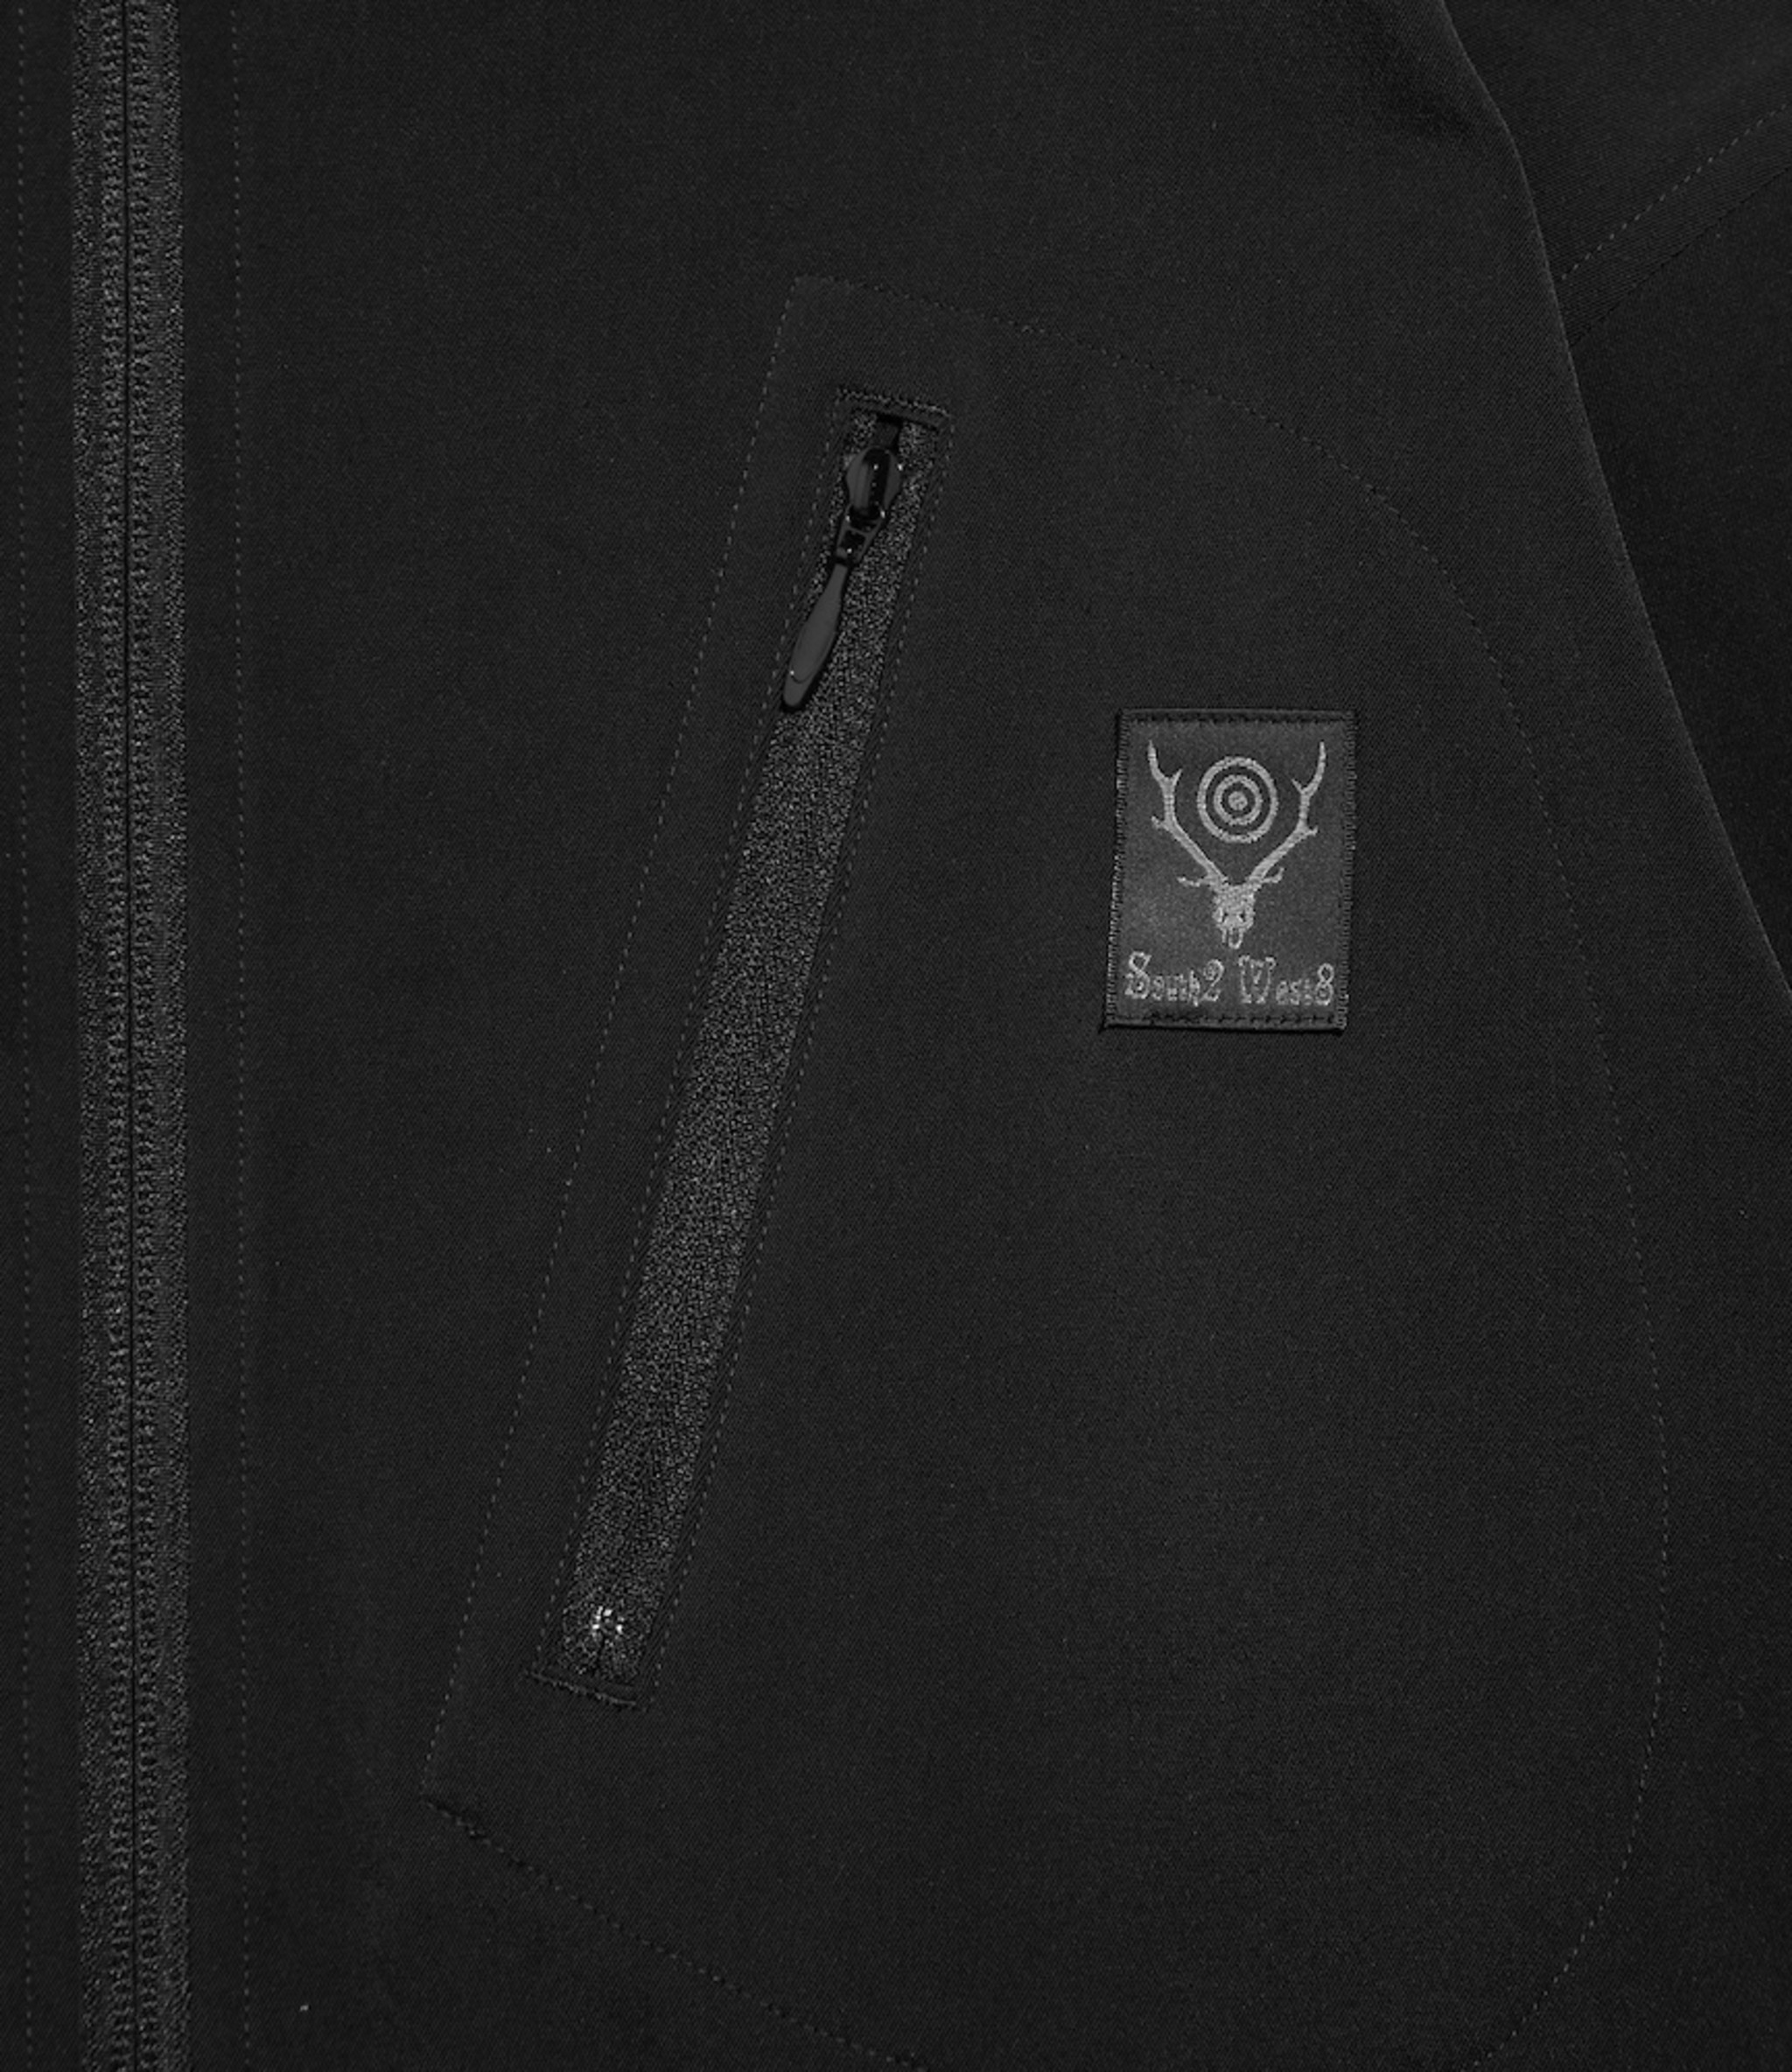 South2 West8 Boulder Shirt - Brushed Lining Twill - Black